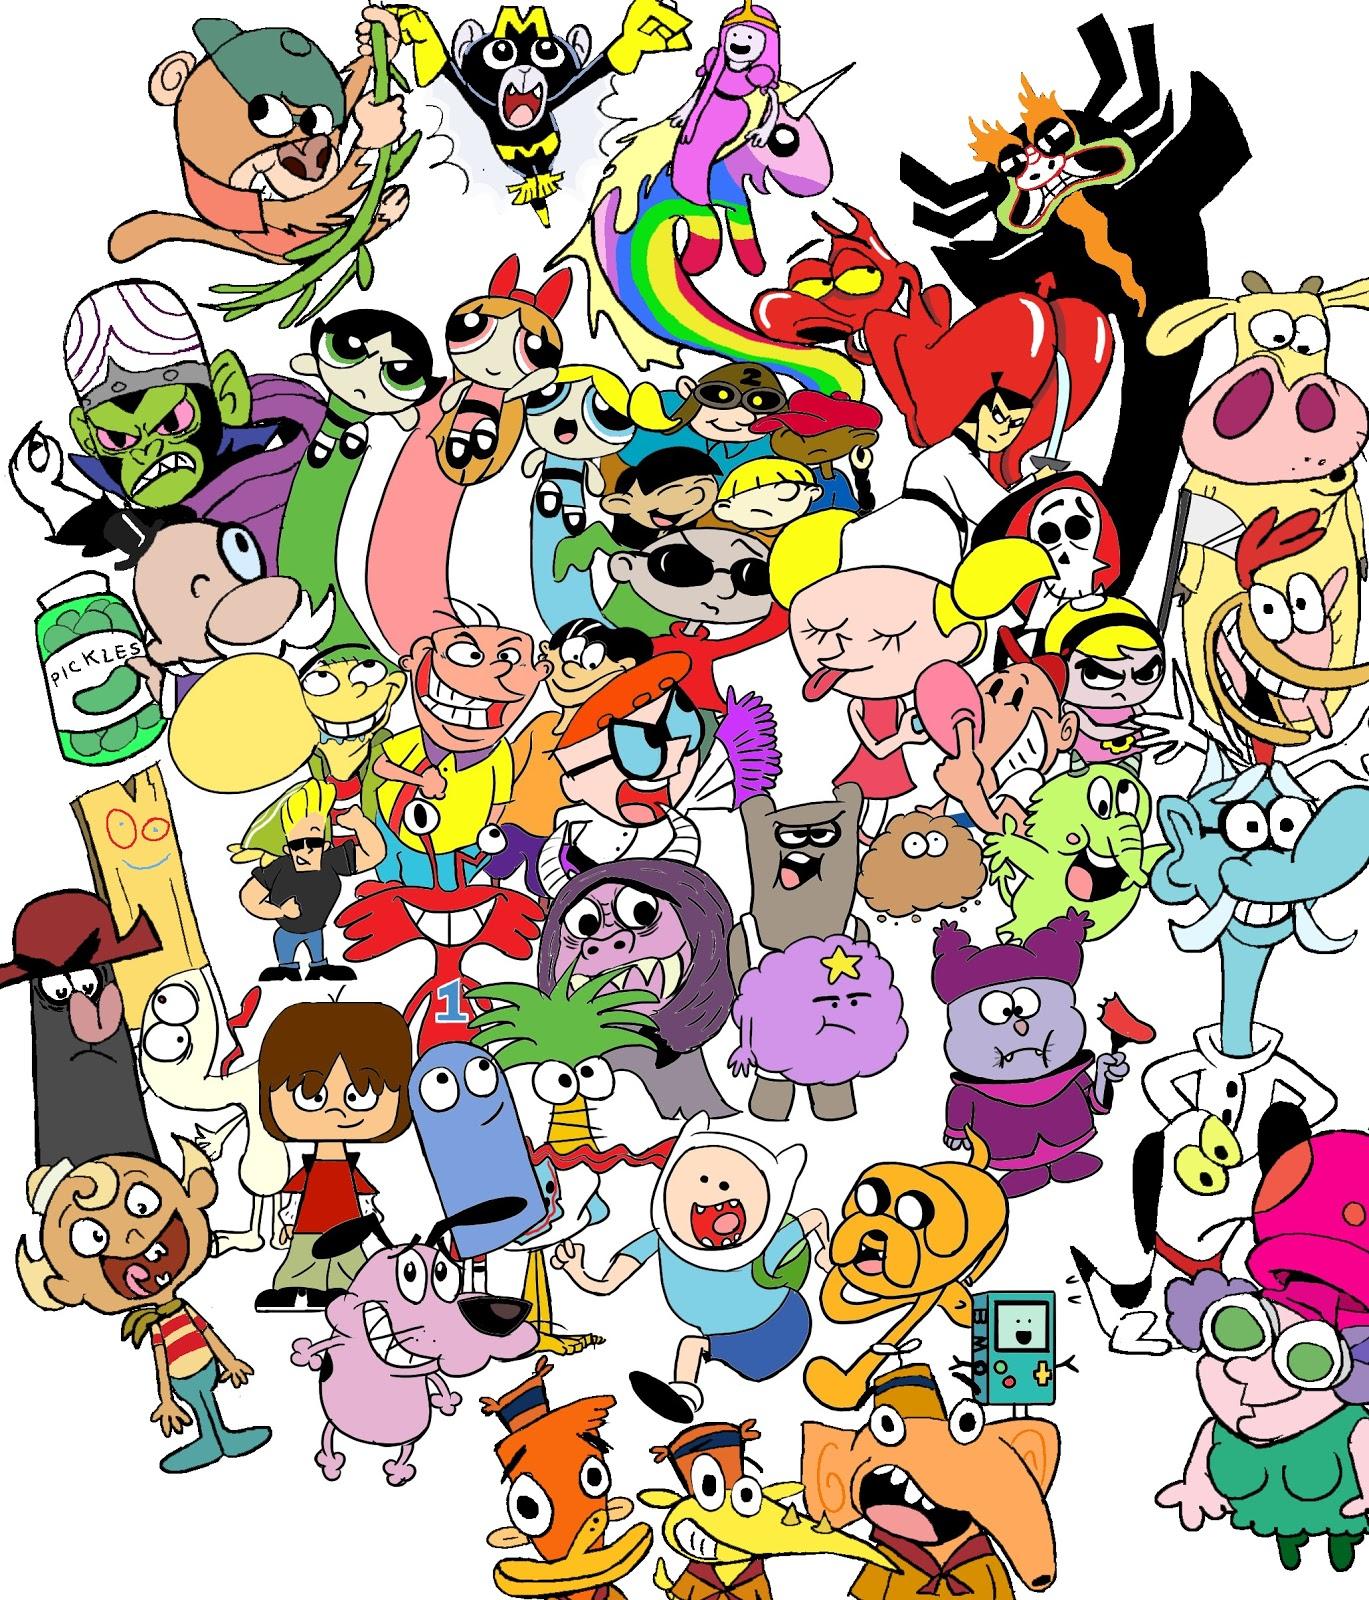 Cartoon Characters Cartoon Network : All cartoon characters from network hot girls